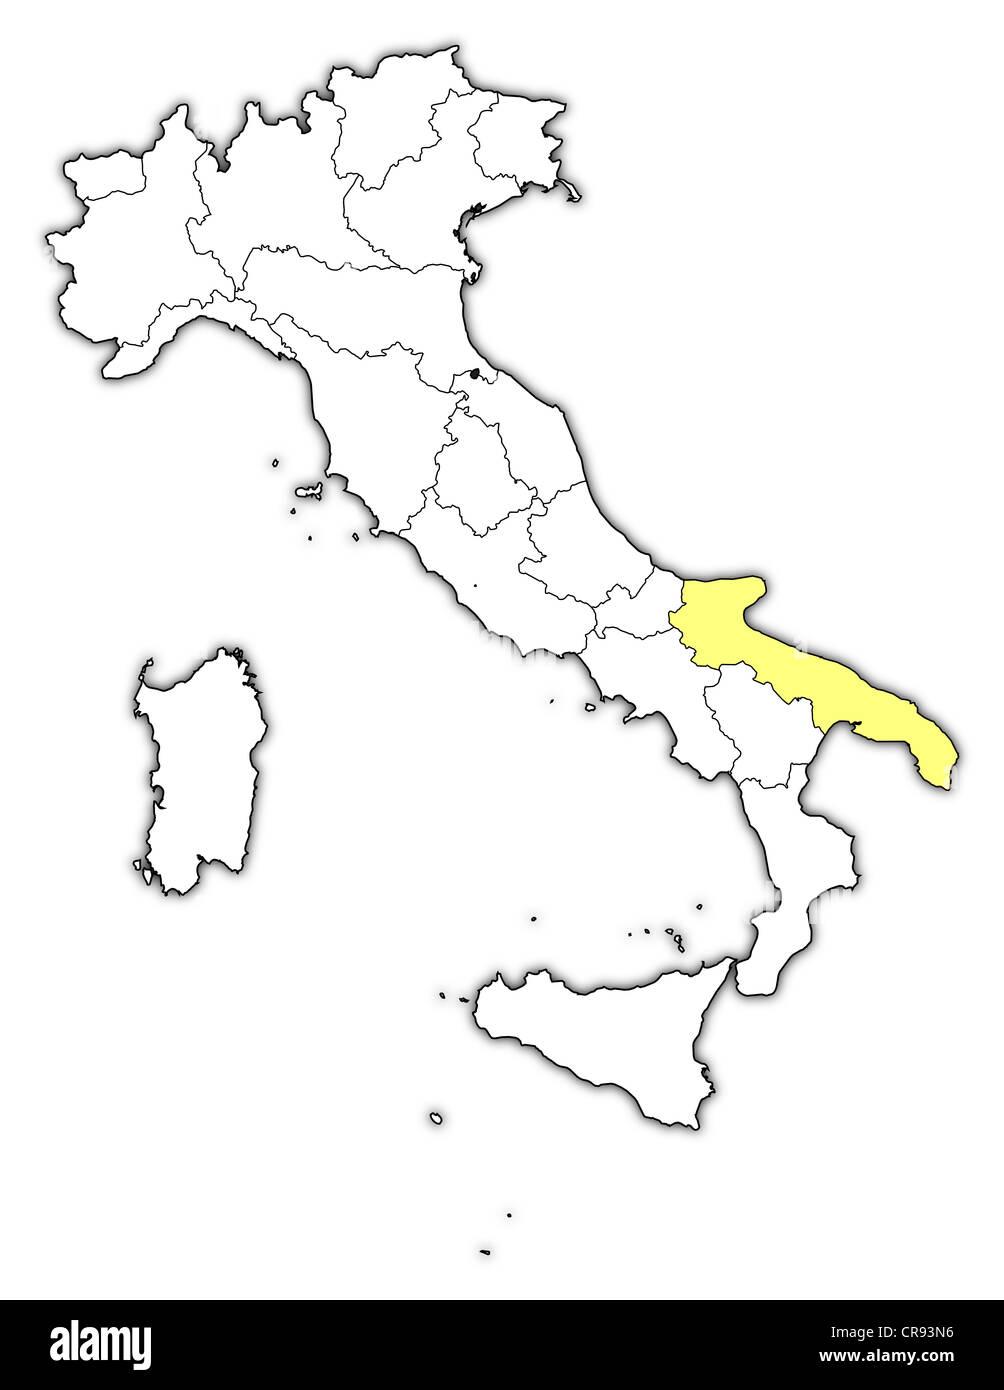 Cartina Dettagliata Puglia.Vettore Di Mappa Di Puglia Immagini E Fotos Stock Alamy